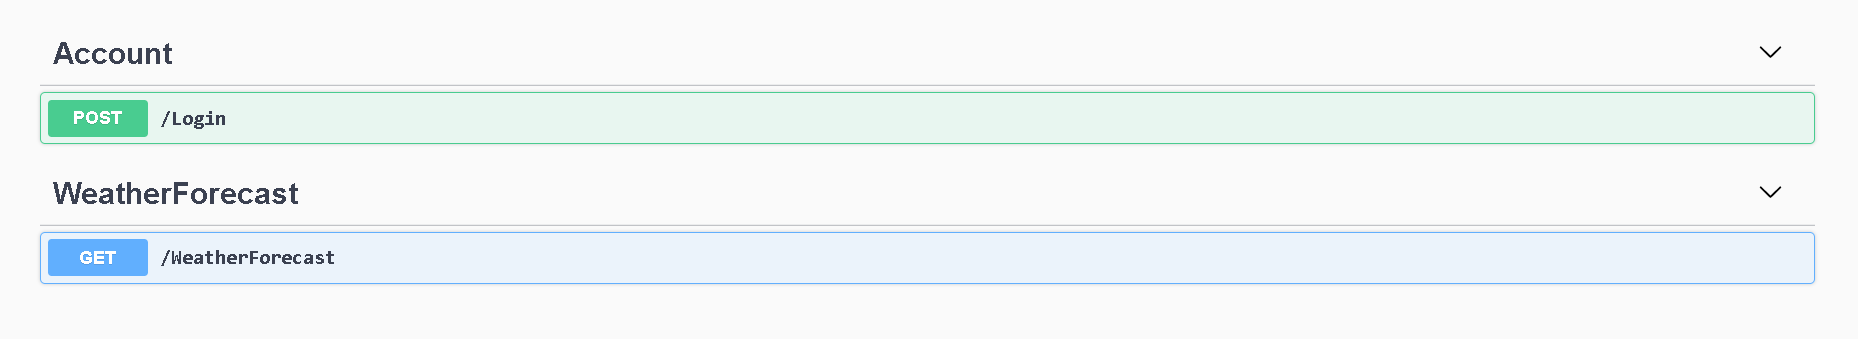 Run project, OpenAPI documentation